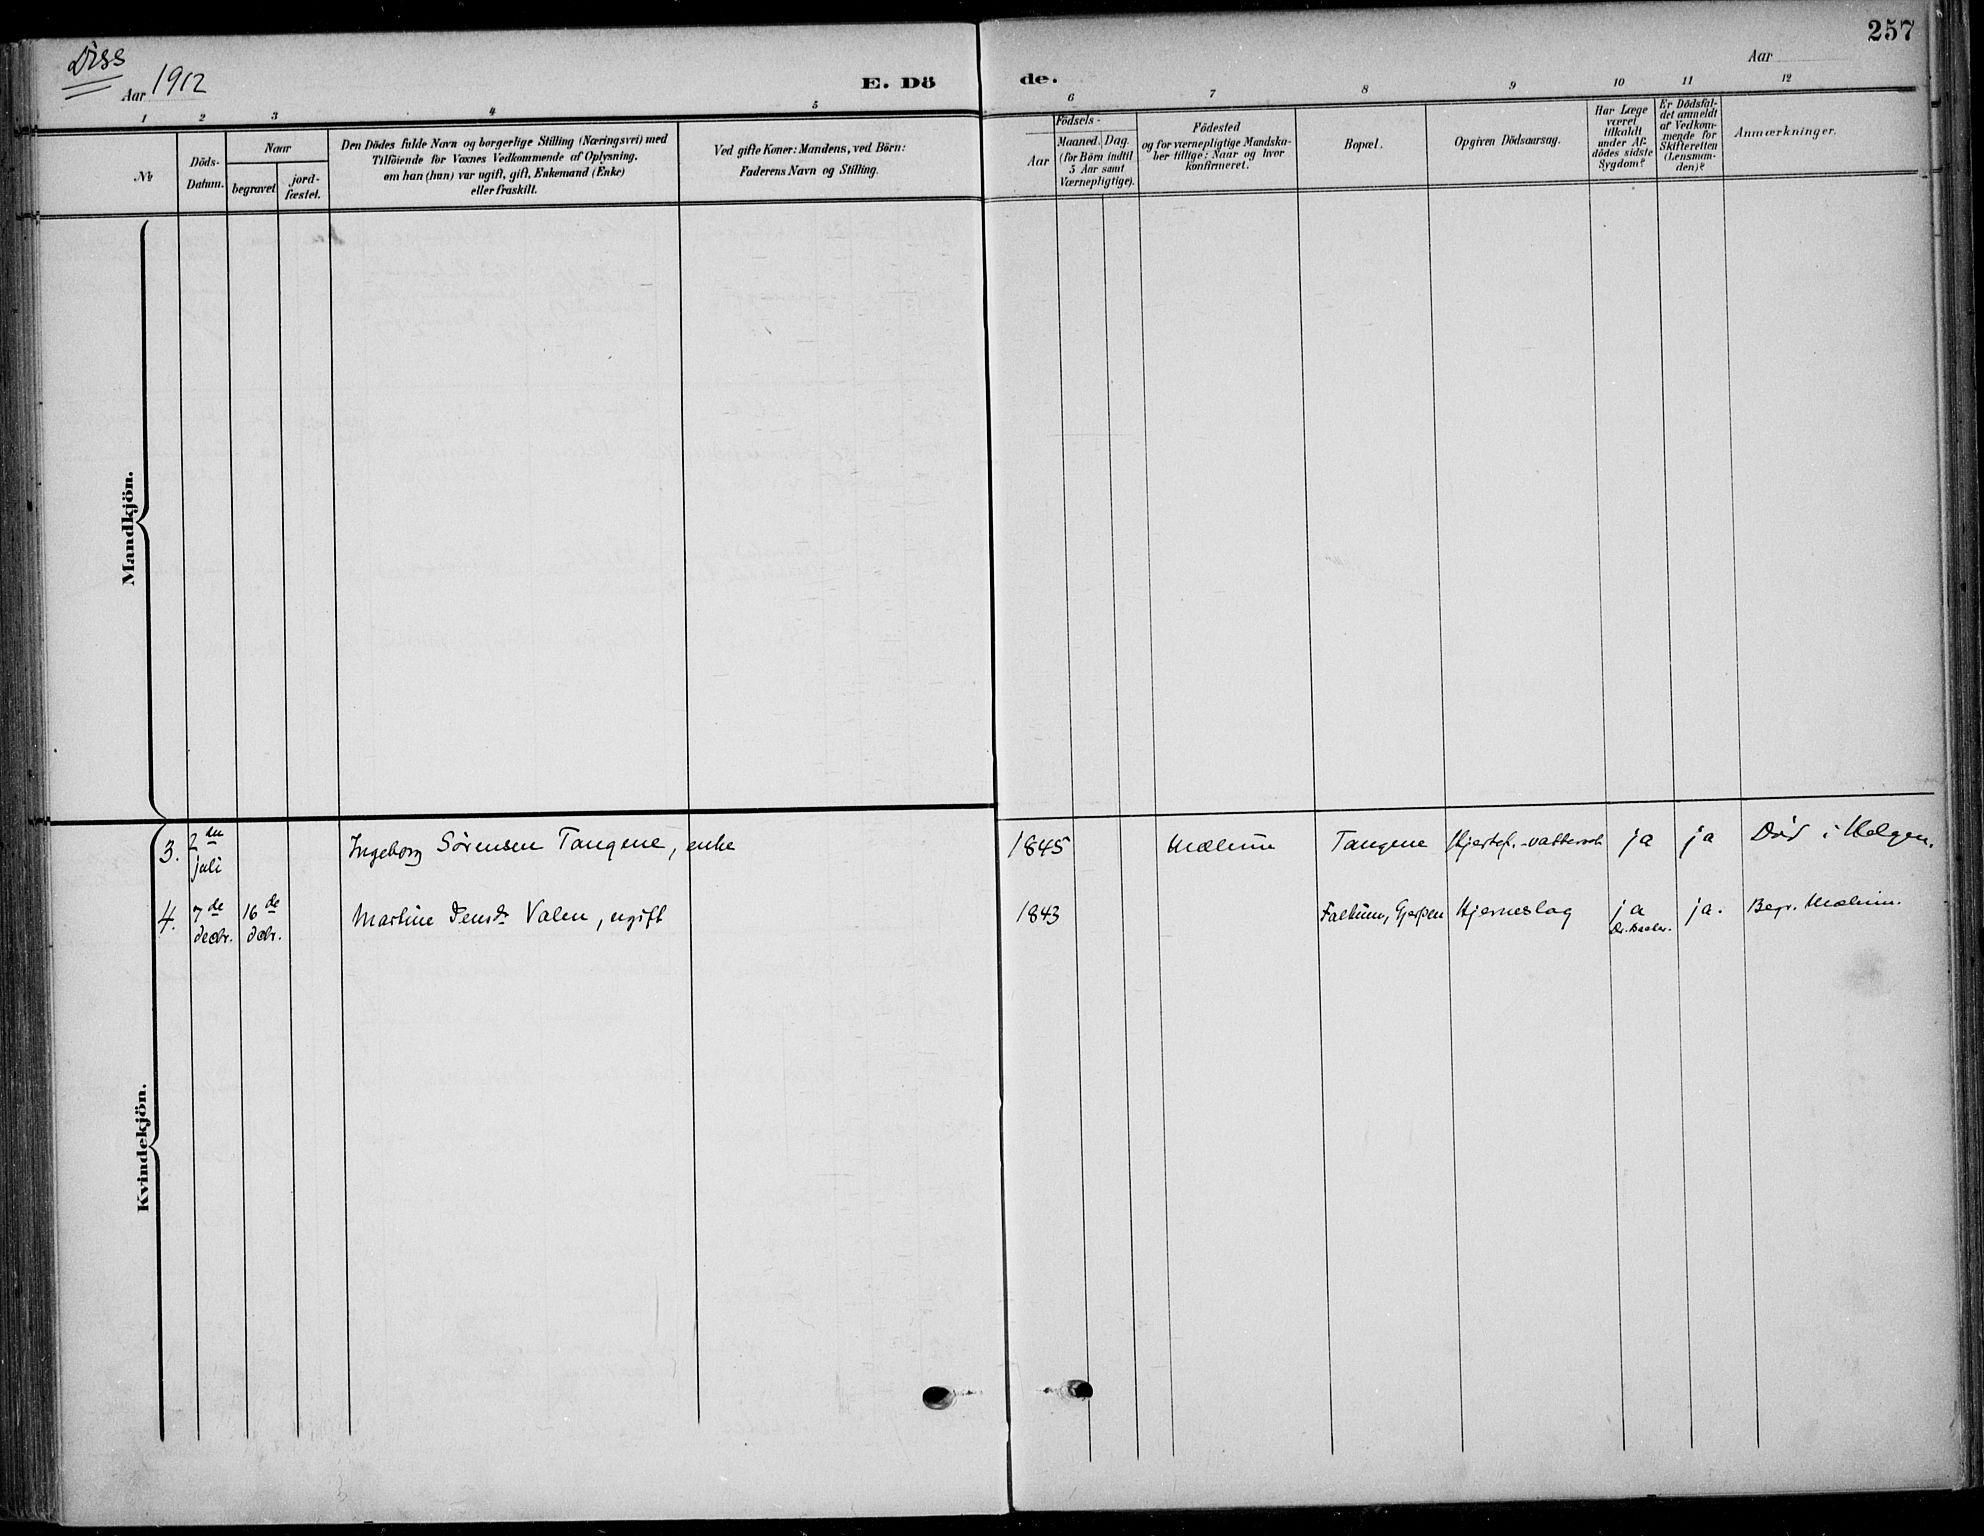 SAKO, Solum kirkebøker, F/Fb/L0003: Ministerialbok nr. II 3, 1901-1912, s. 257